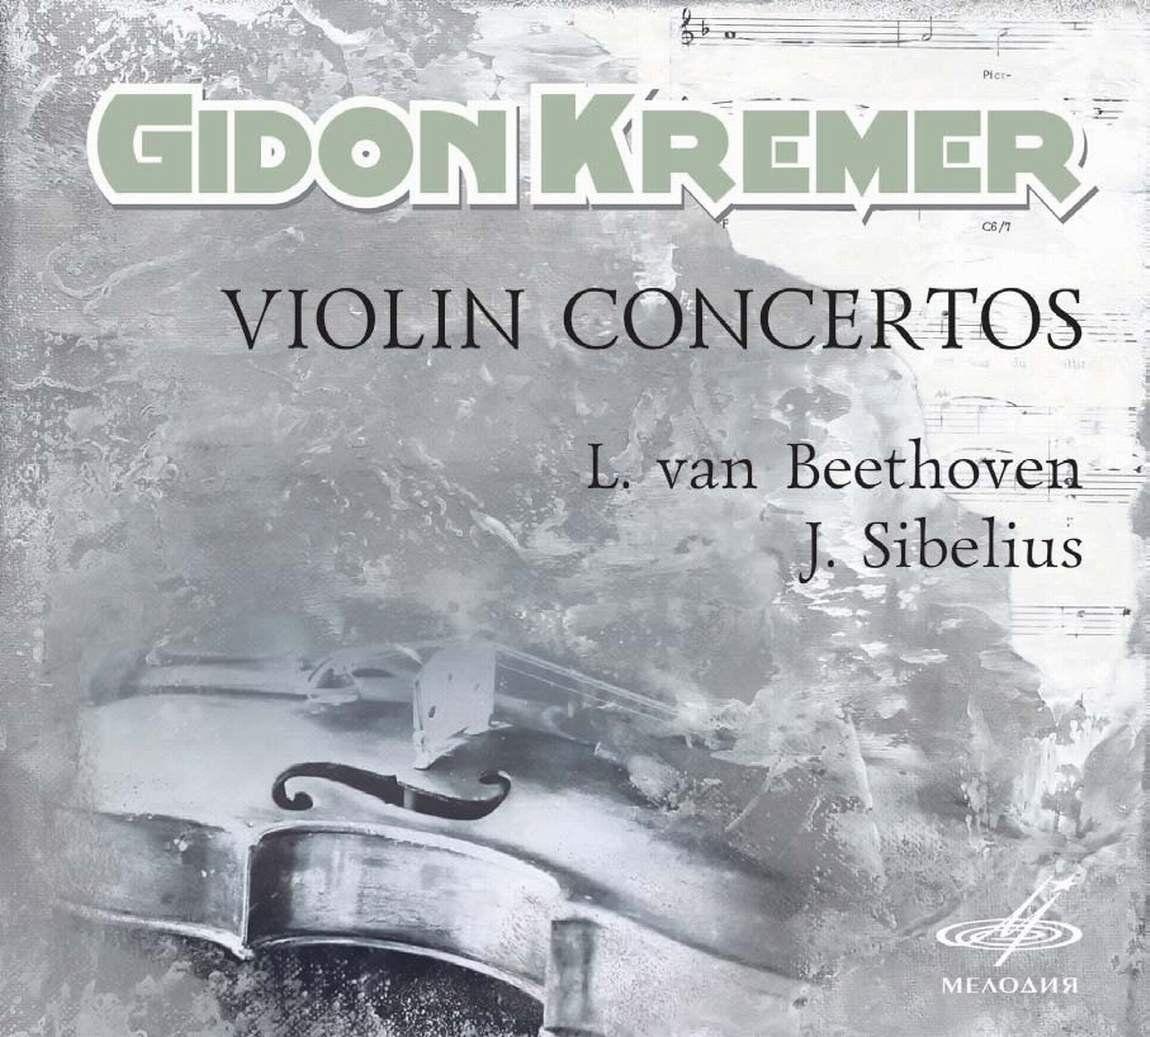 Violin Concerto in D minor, Op. 47 Gidon Kremer; The USSR State Symphony Orchestra / Yuri Temirkanov // Melodiya Mel CD 10-02022 - Recorded 1970